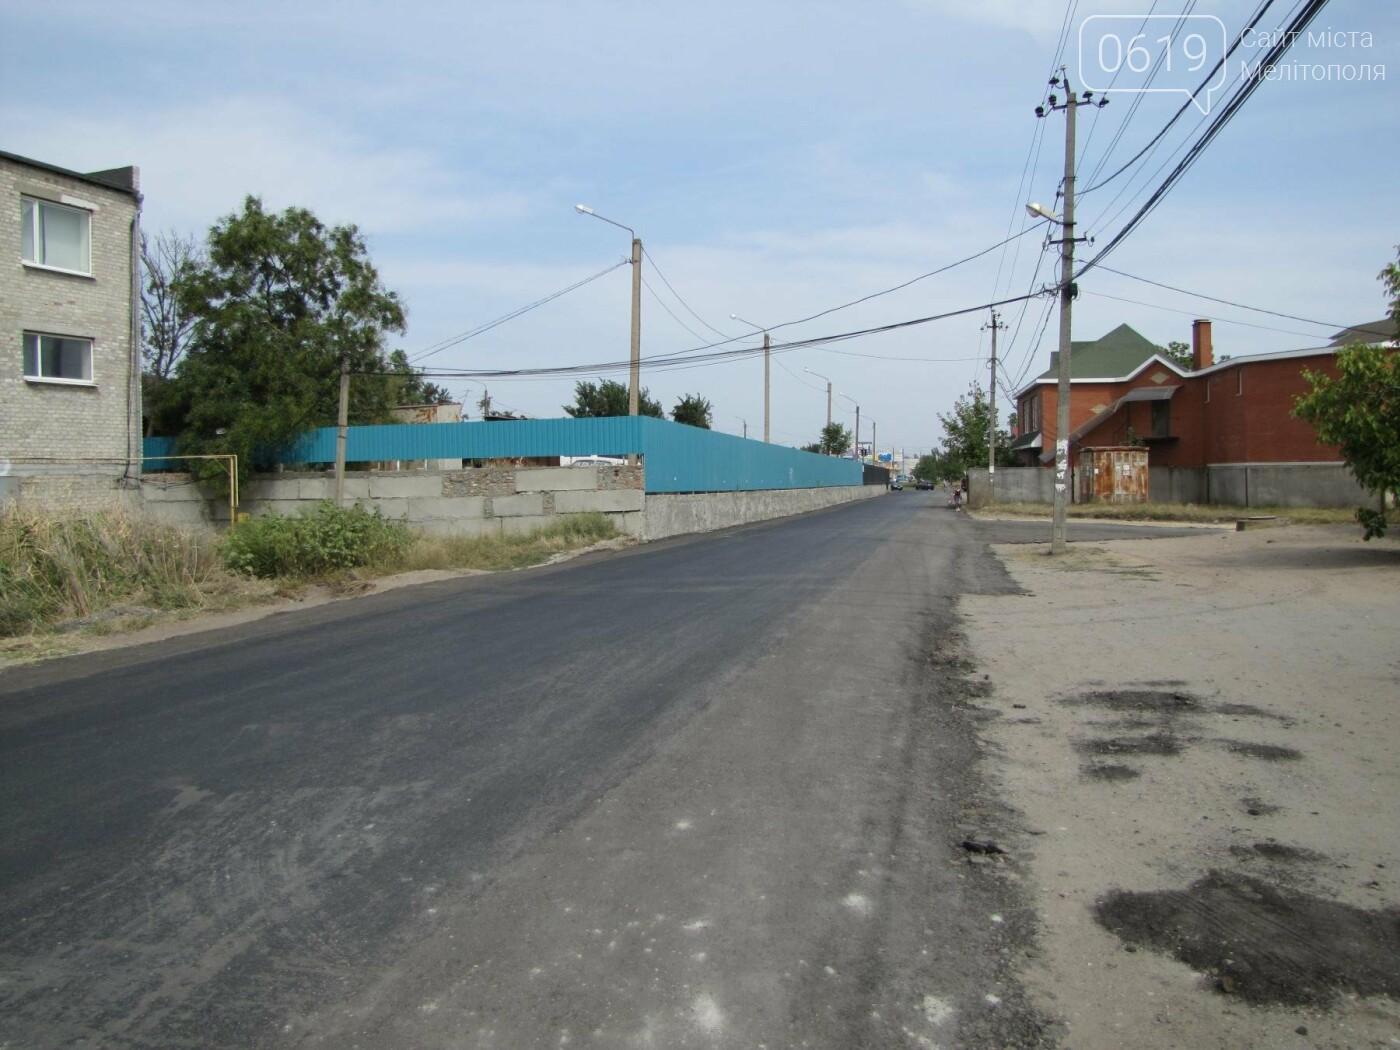 В Мелитополе отремонтировали дорогу на окраине, фото-2, Фото сайта 0619